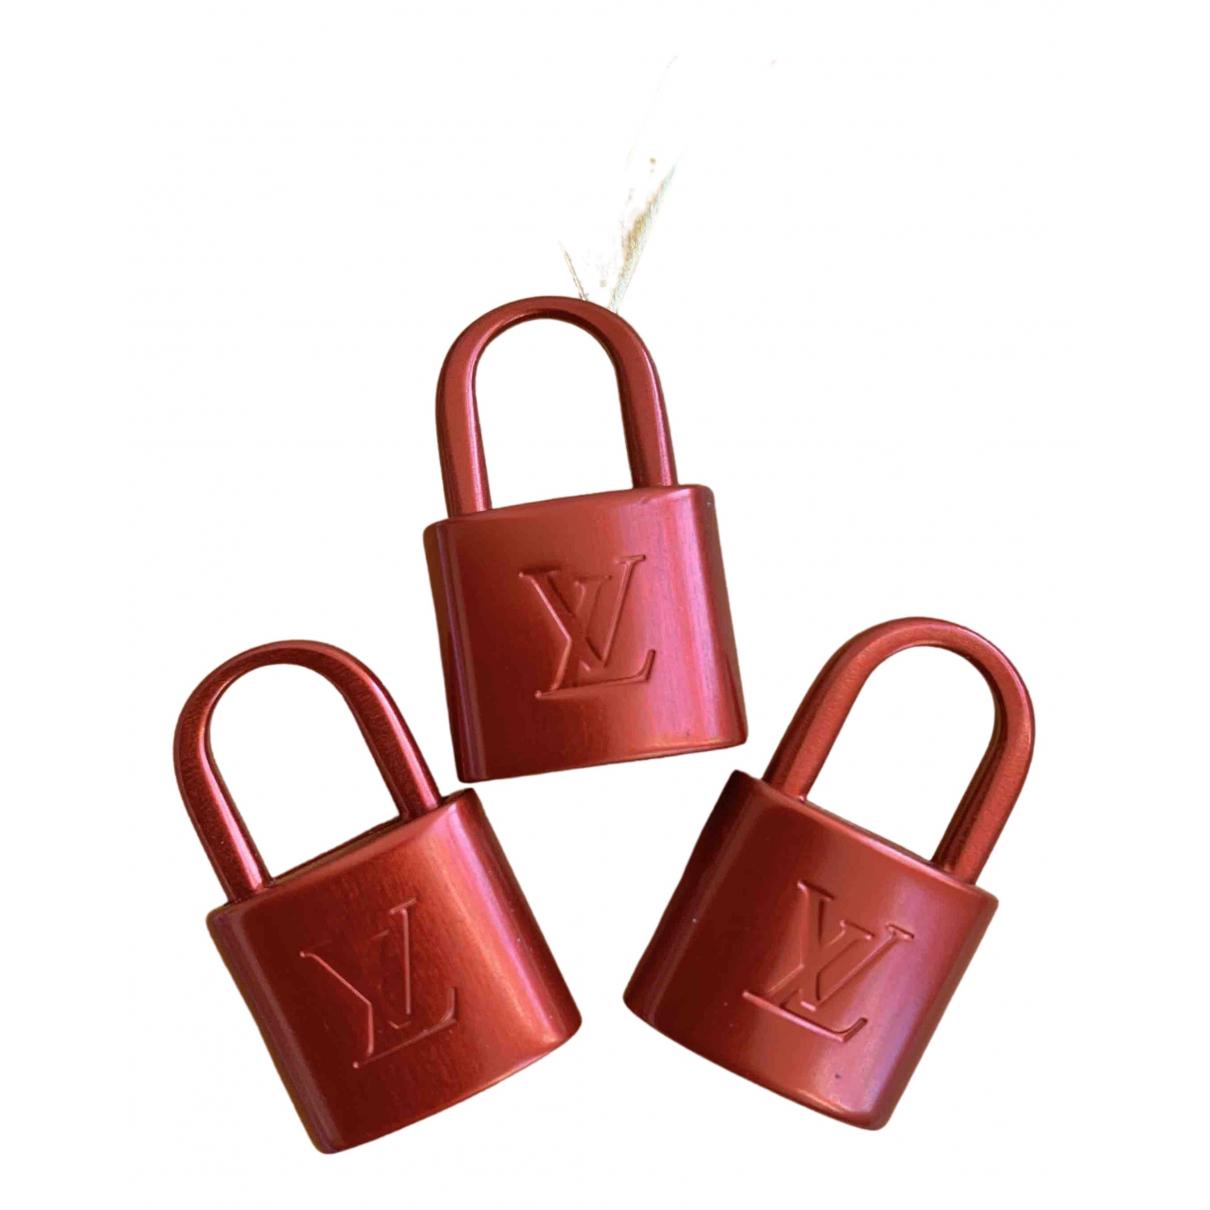 Louis Vuitton \N Taschenschmuck in  Rot Metall